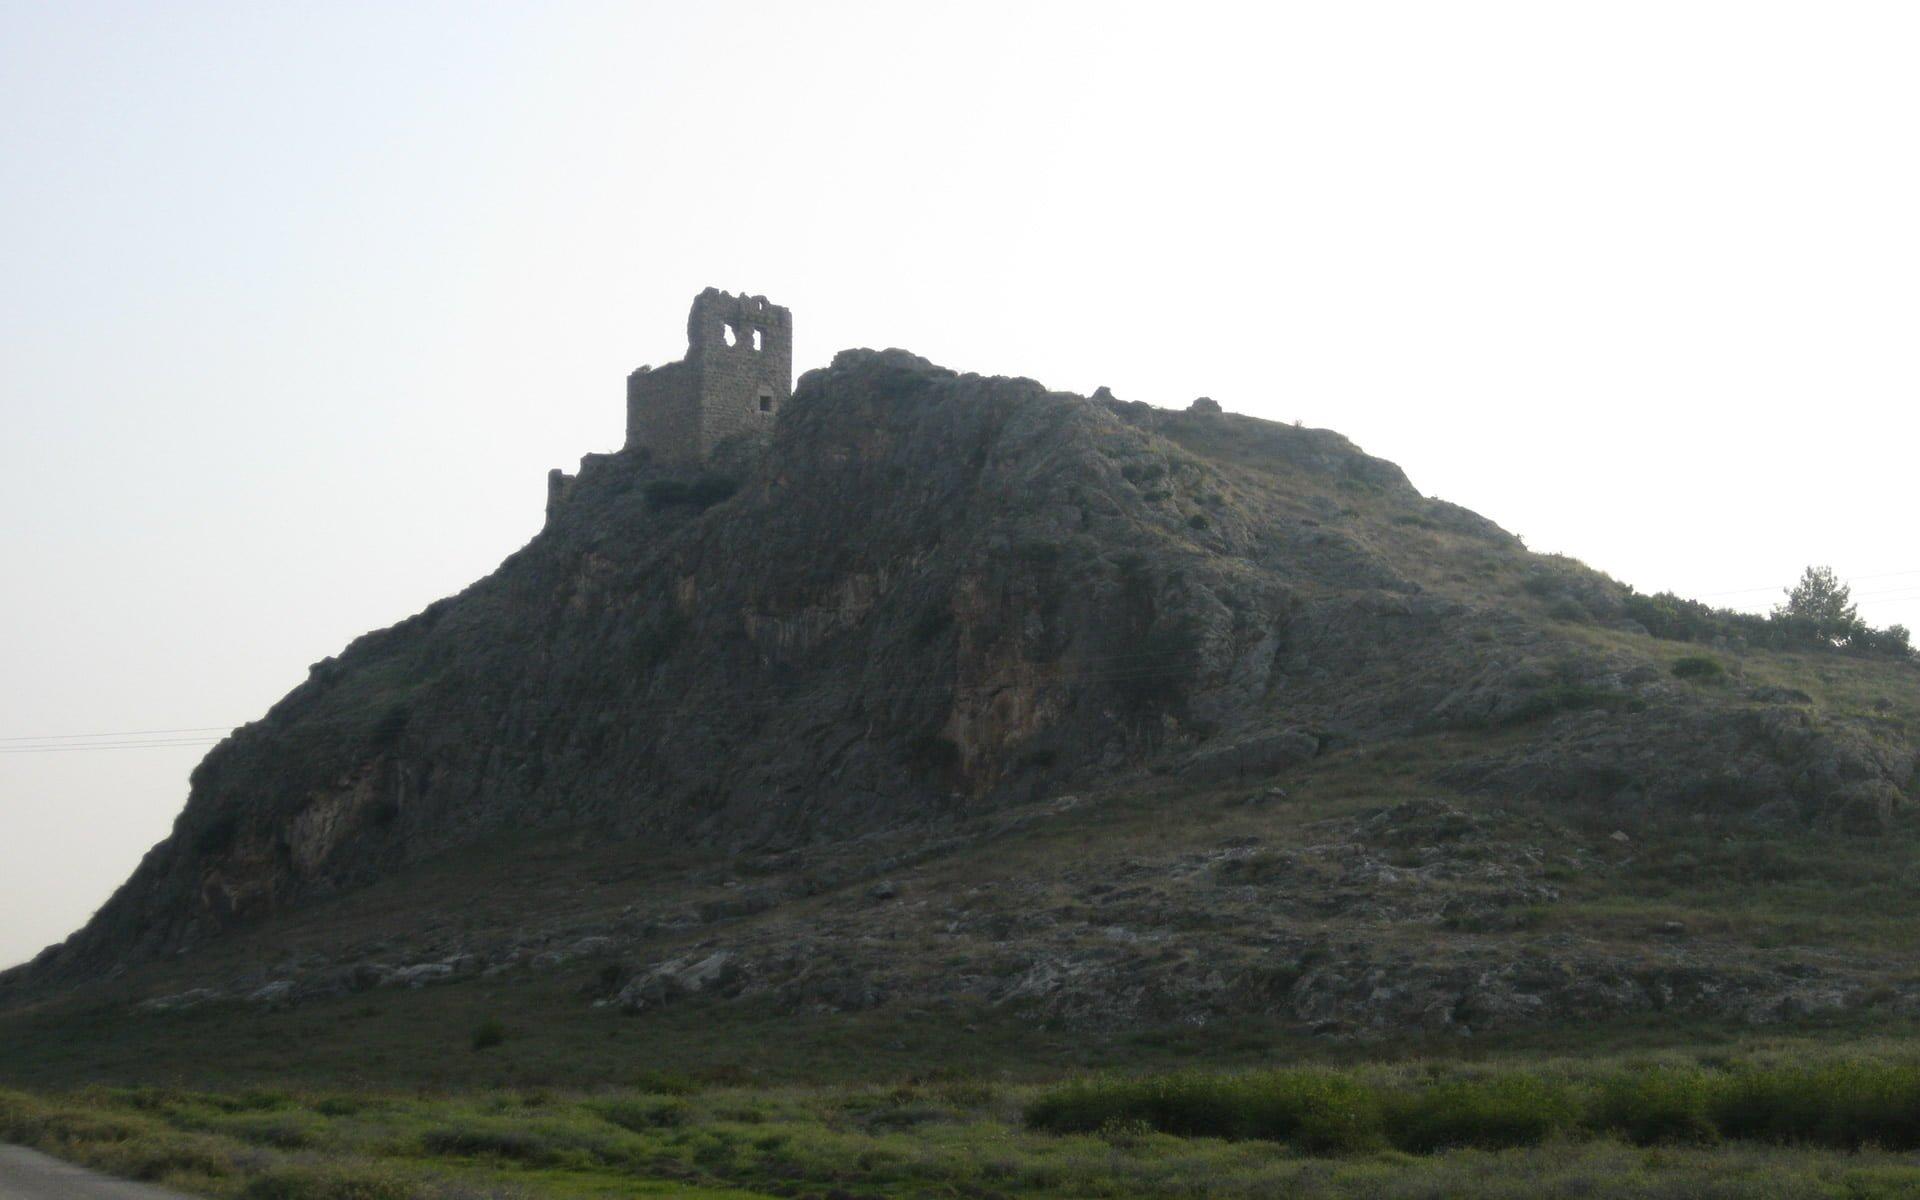 Hemite Kalesi